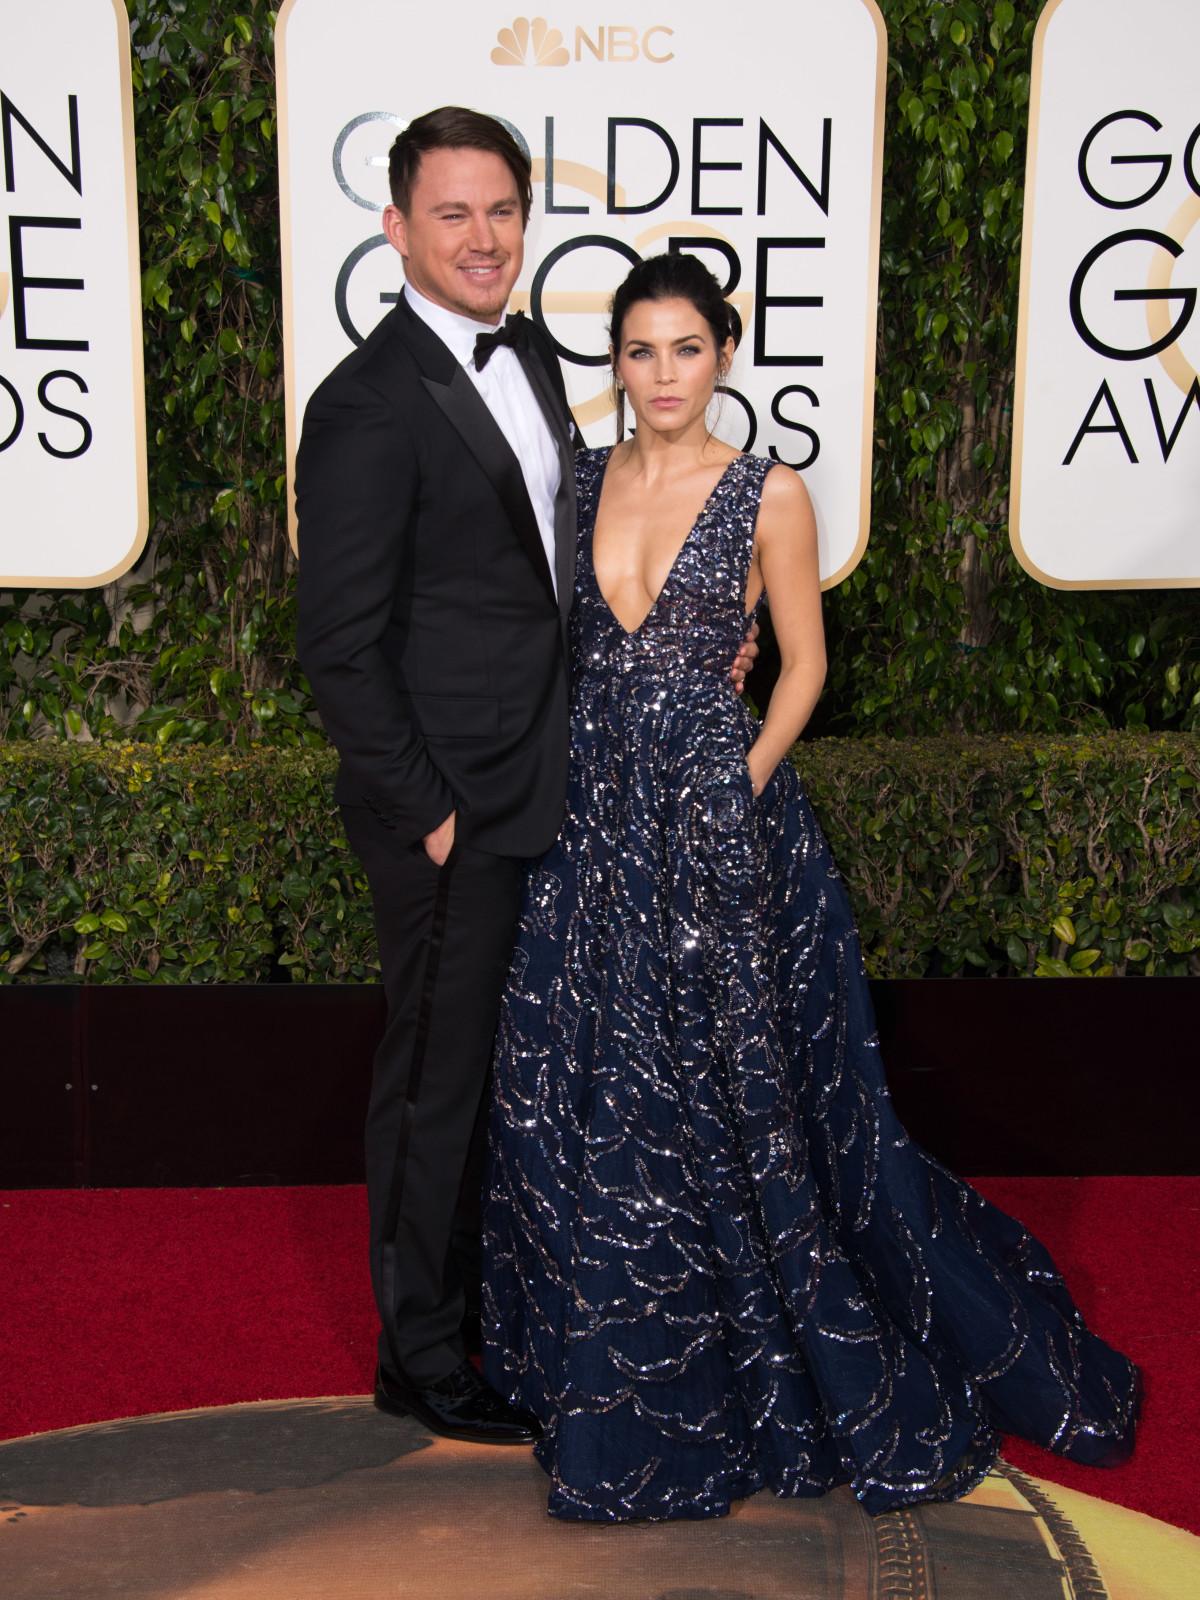 Channing Tatum and Jenna Dewan Tatum at Golden Globes